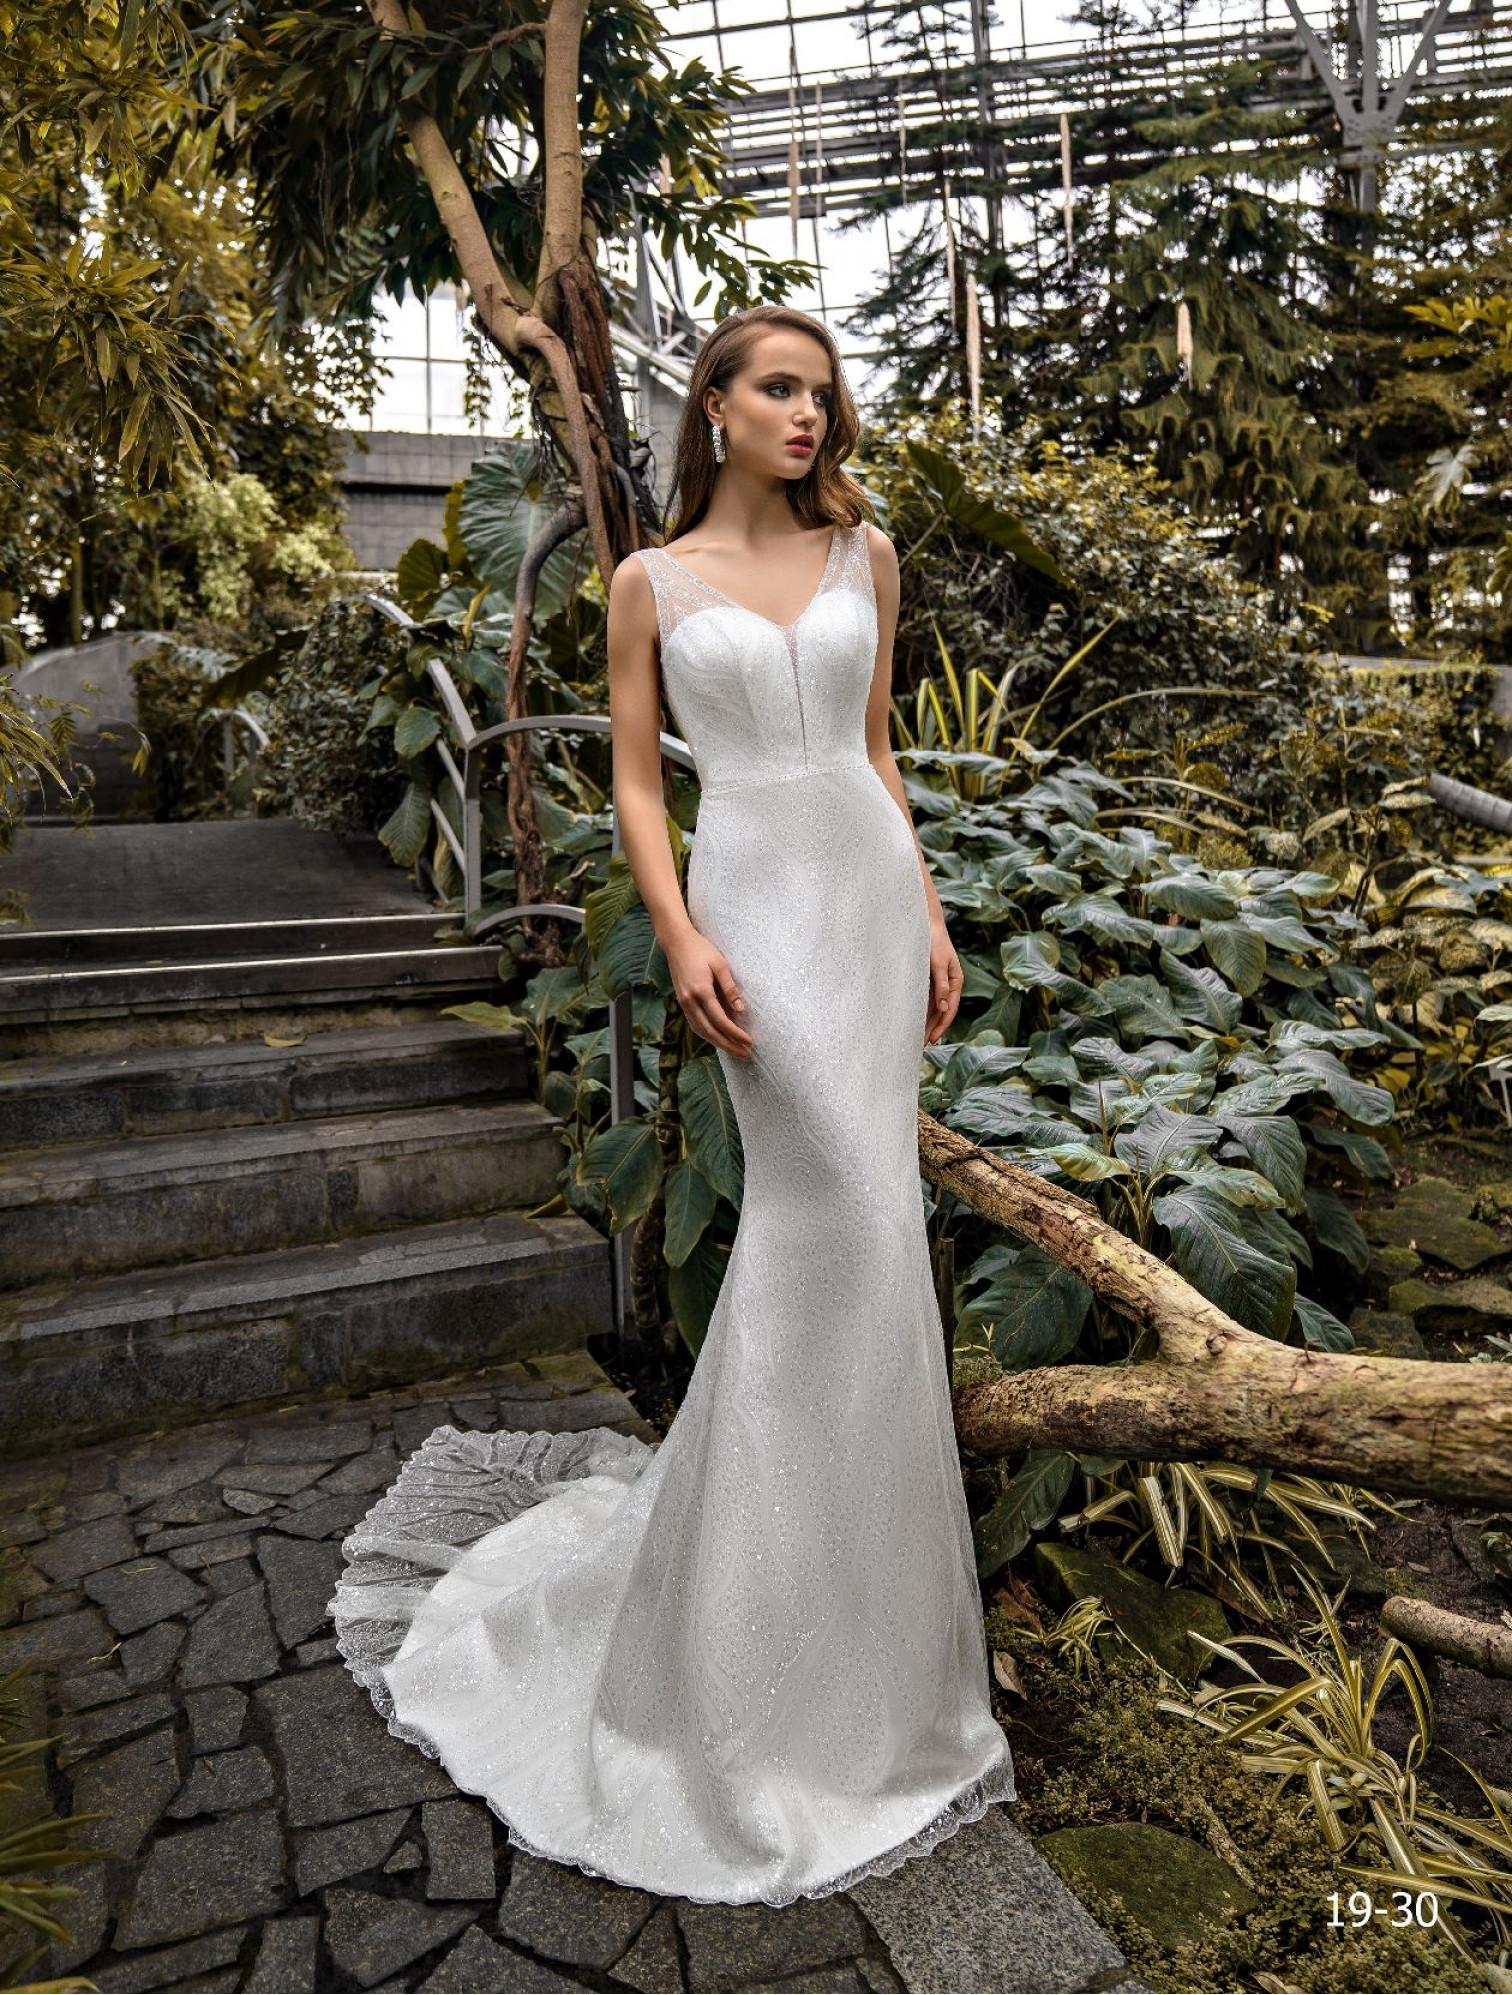 Wedding dress 19-30